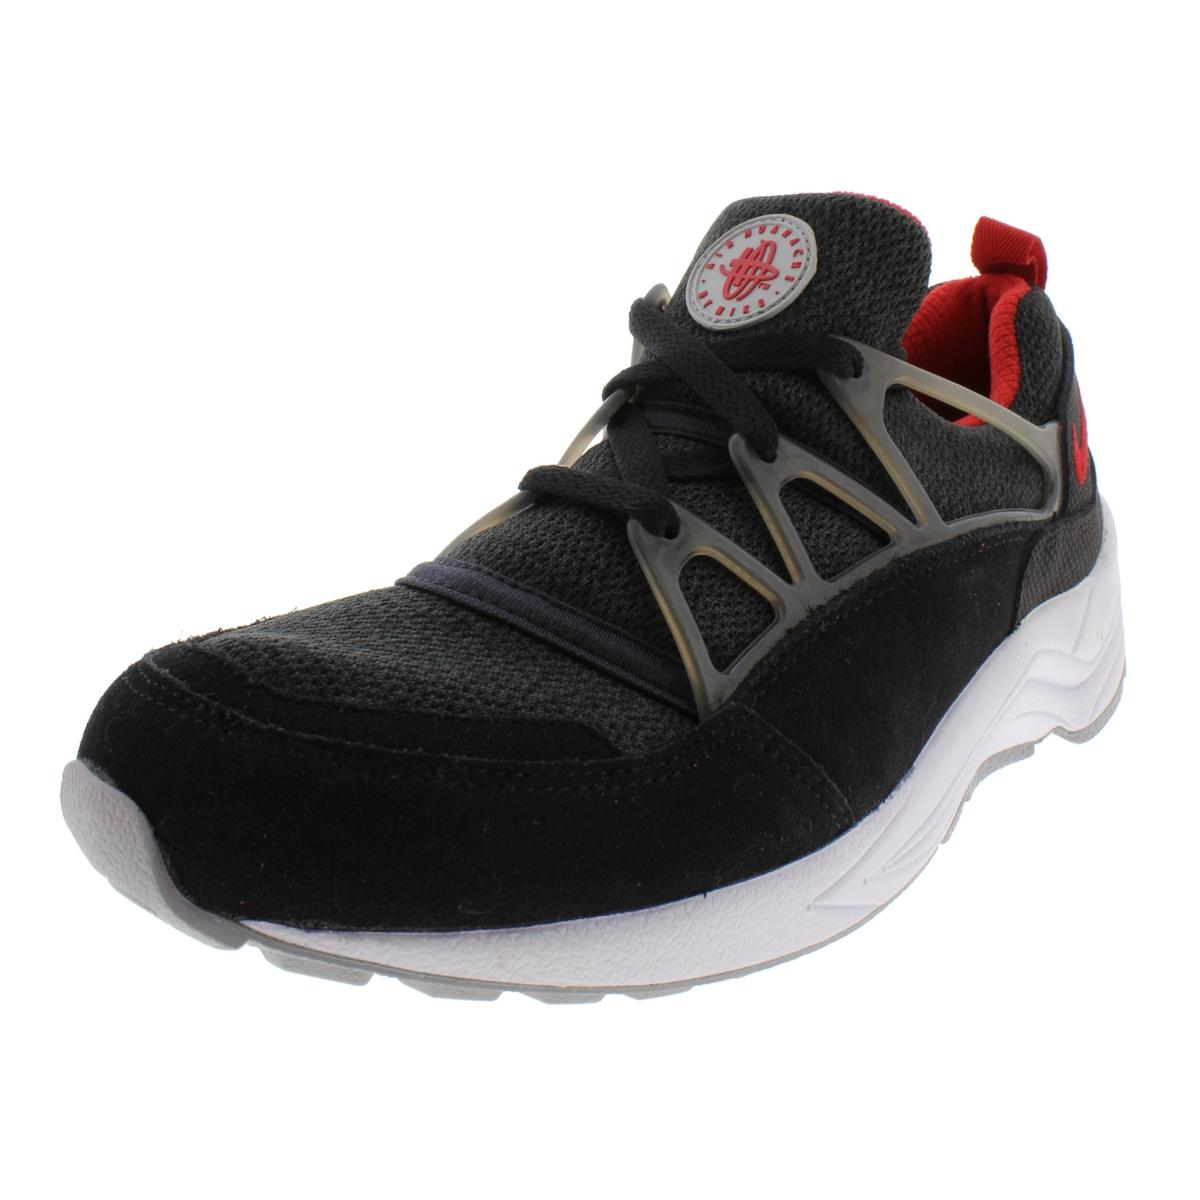 Light Nike Huarache Media Shoes Sneakers Air Mens Mixed Athletic lFK1cJT3